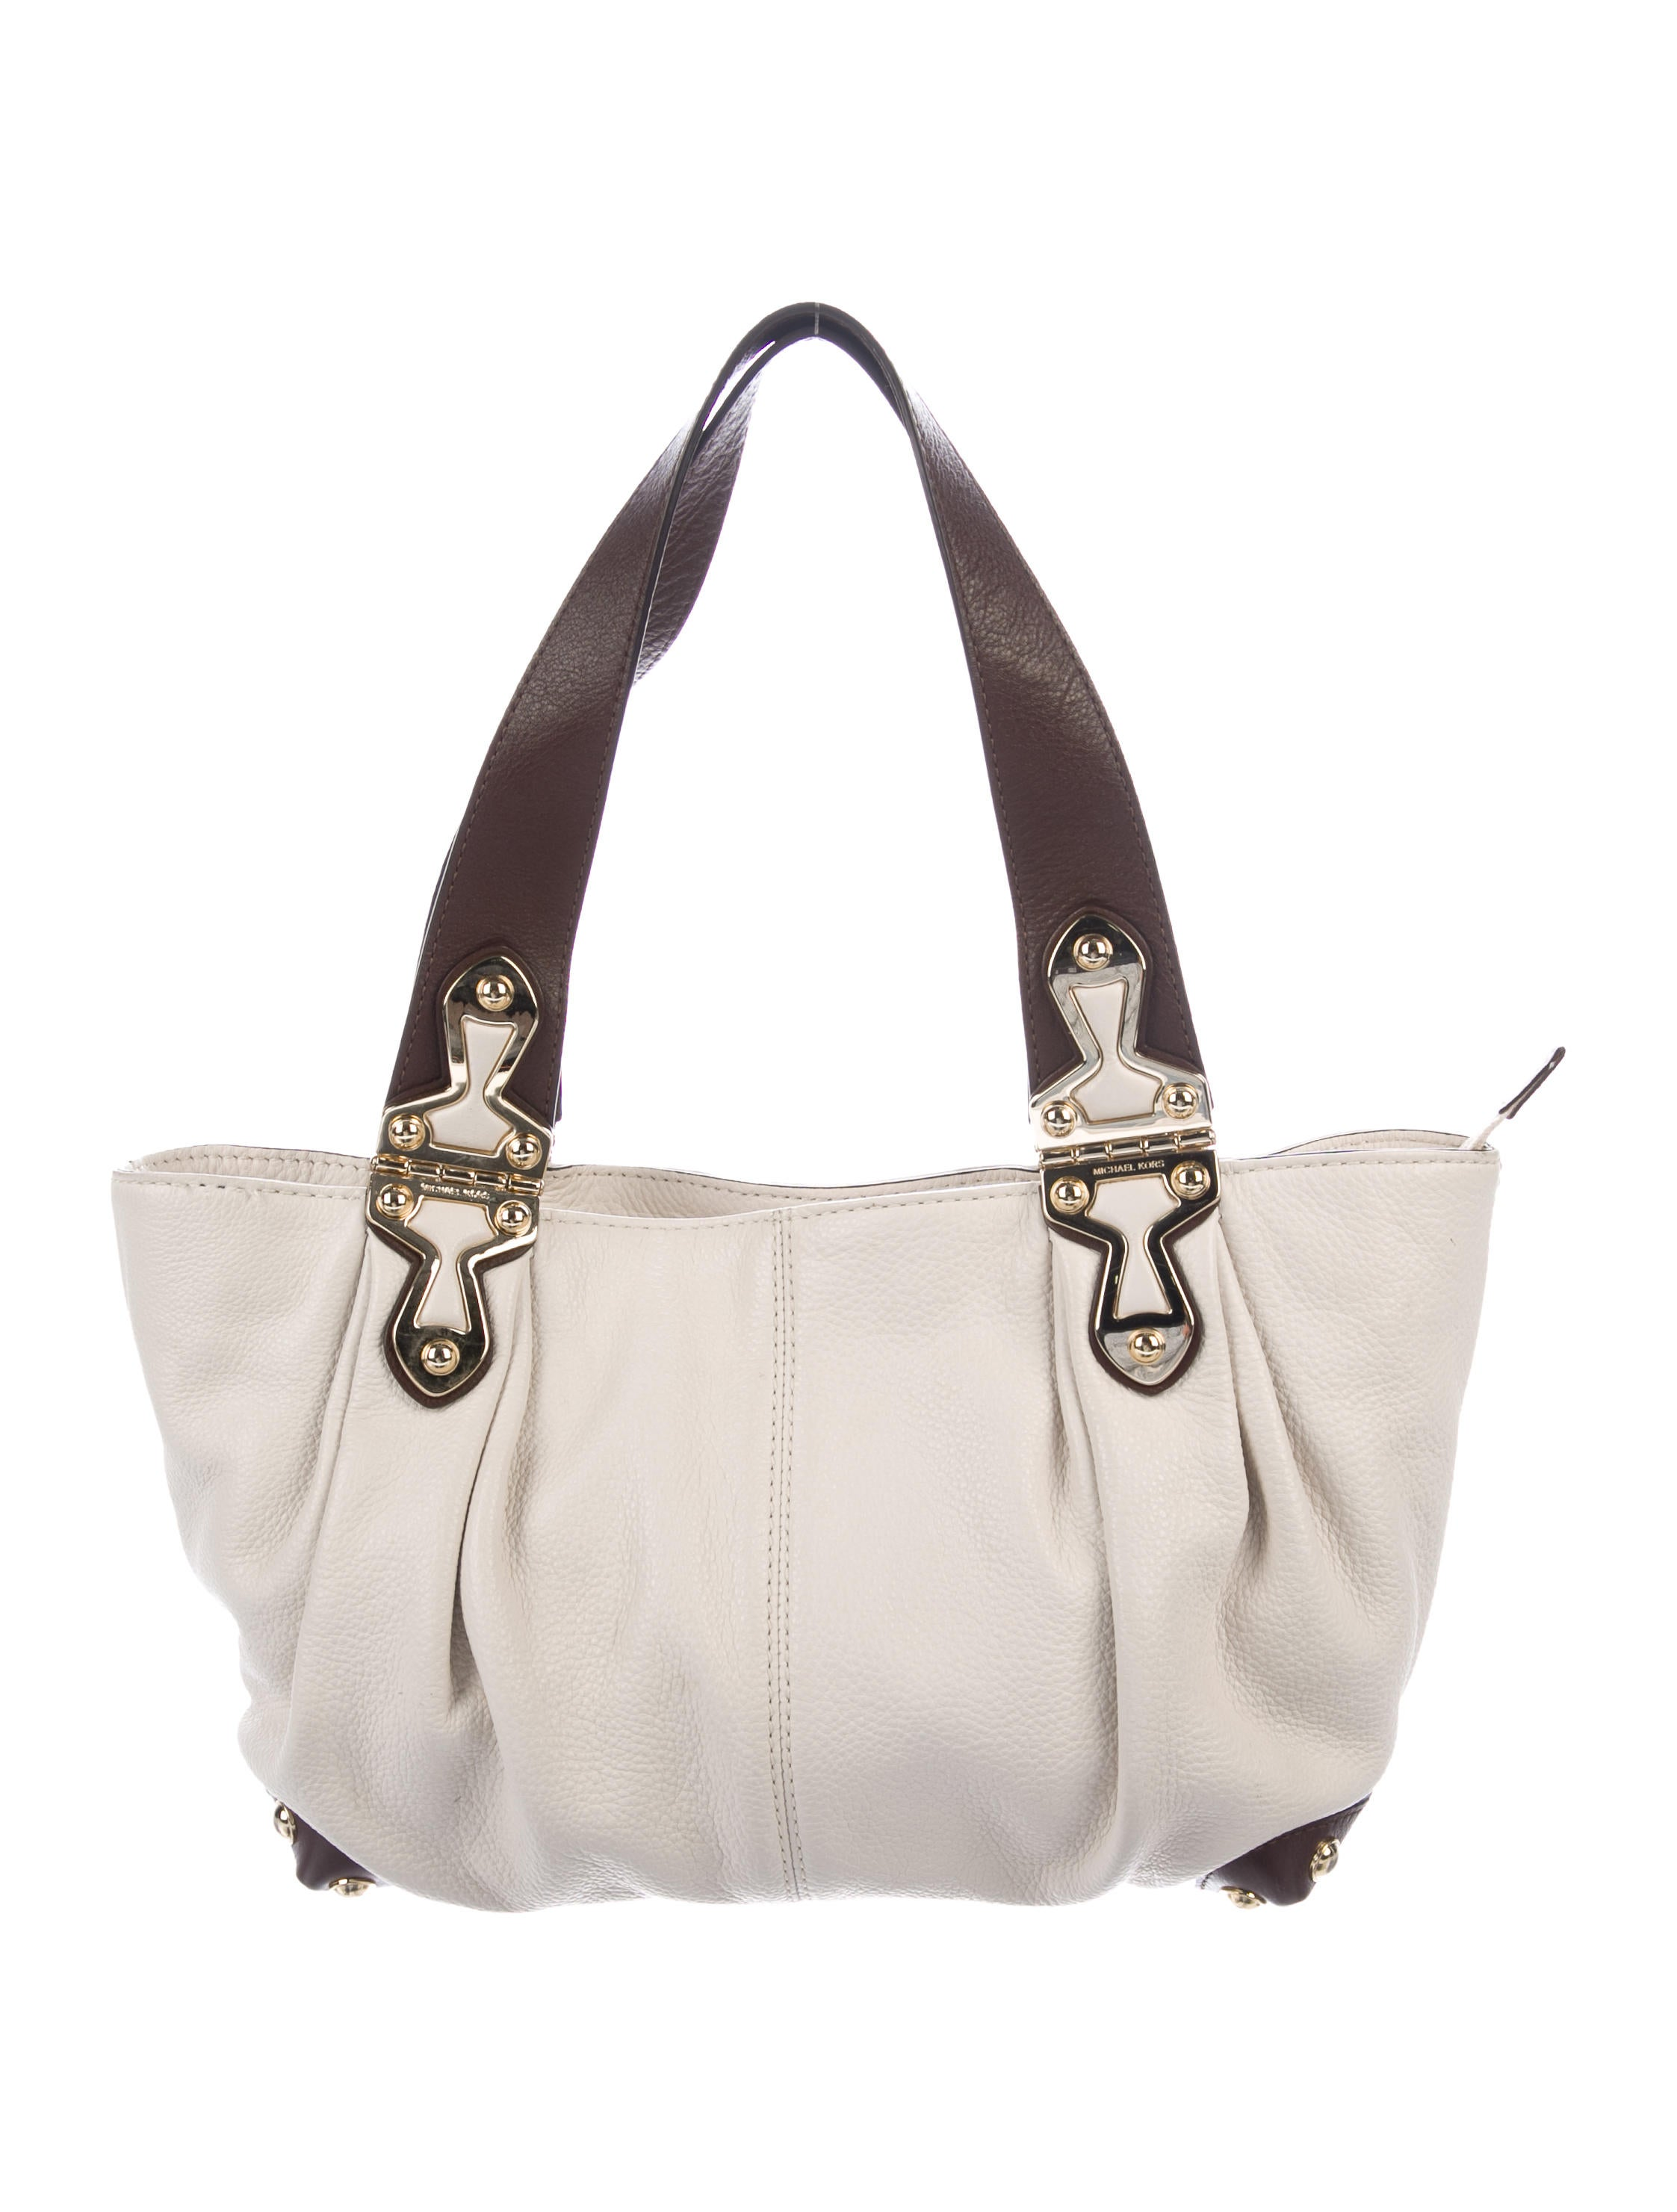 Michael Kors Leather Joplin Bag